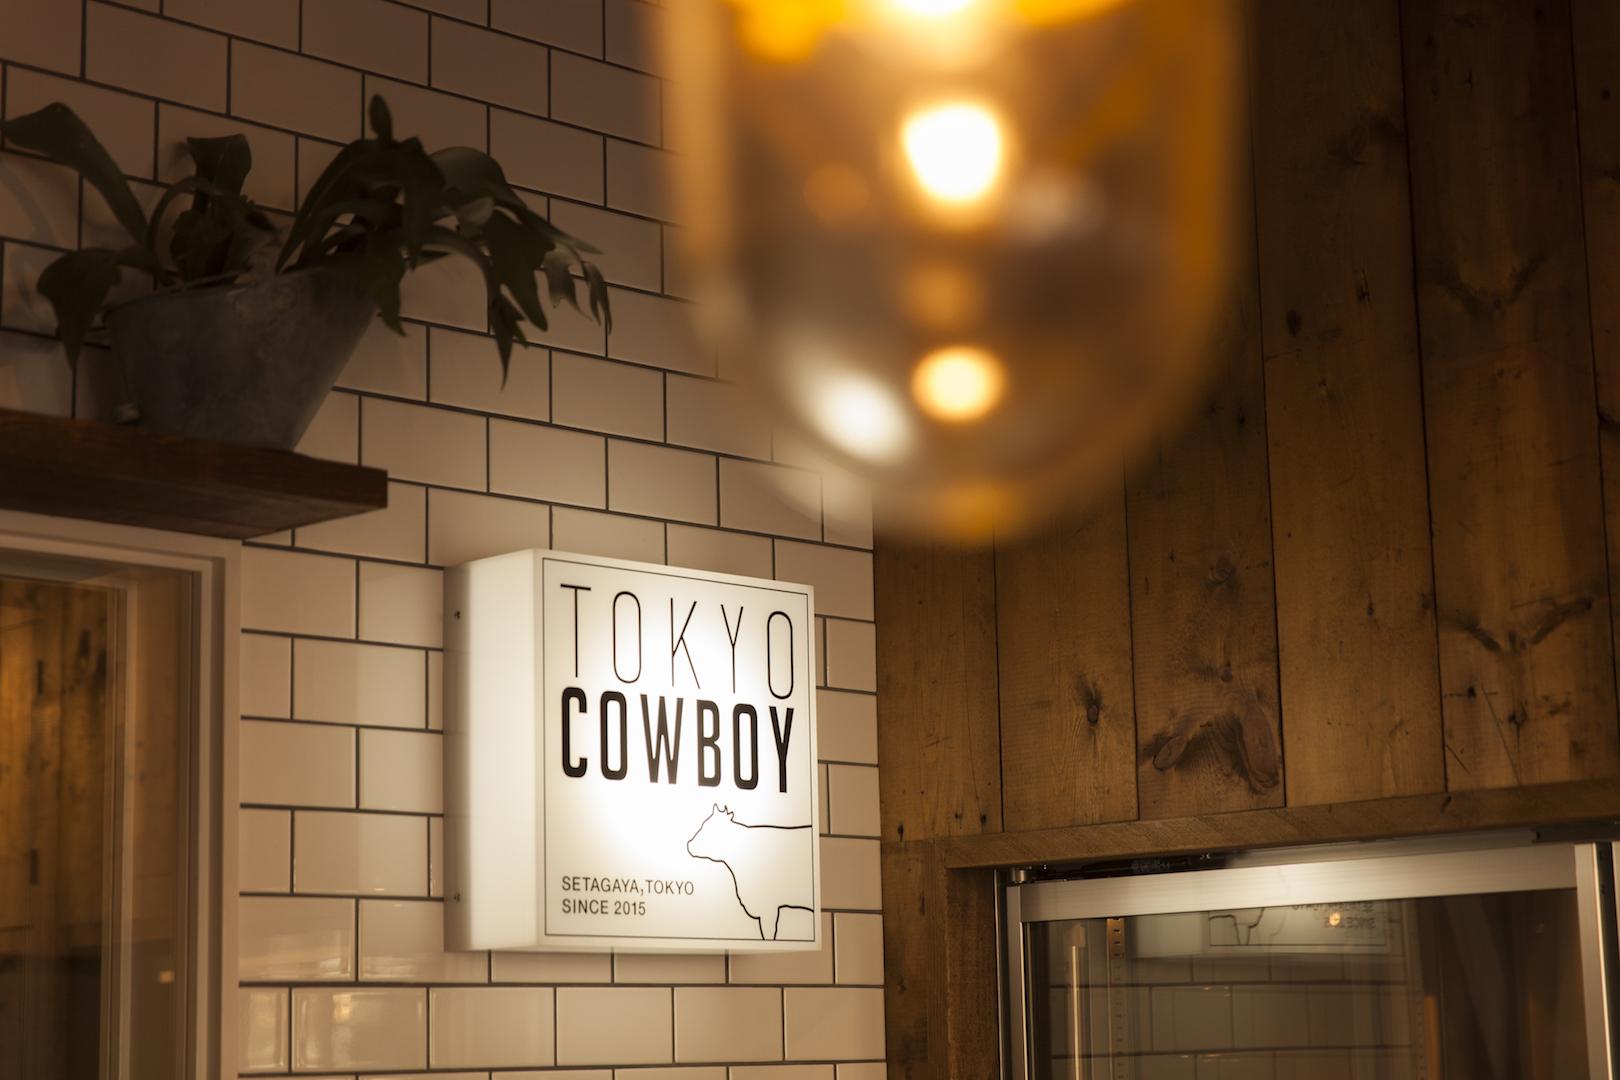 TOKYO COWBOY紹介画像2